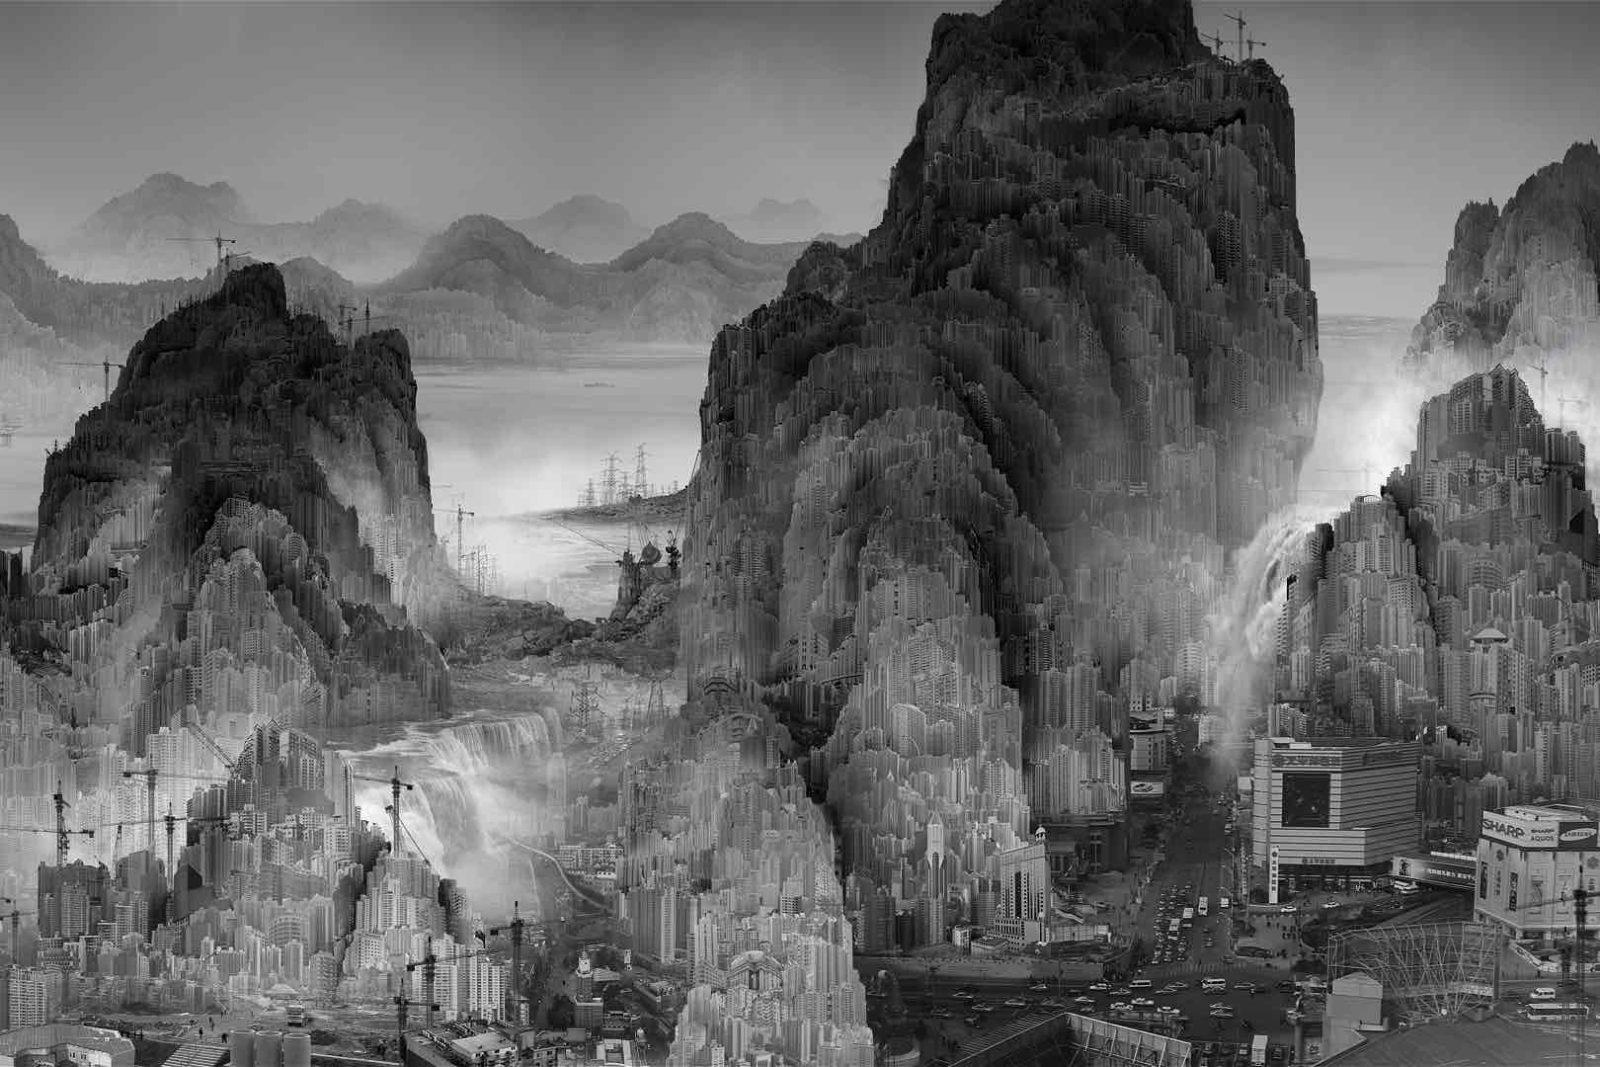 Yang Yongliang (né 1980), Phantom Landscape